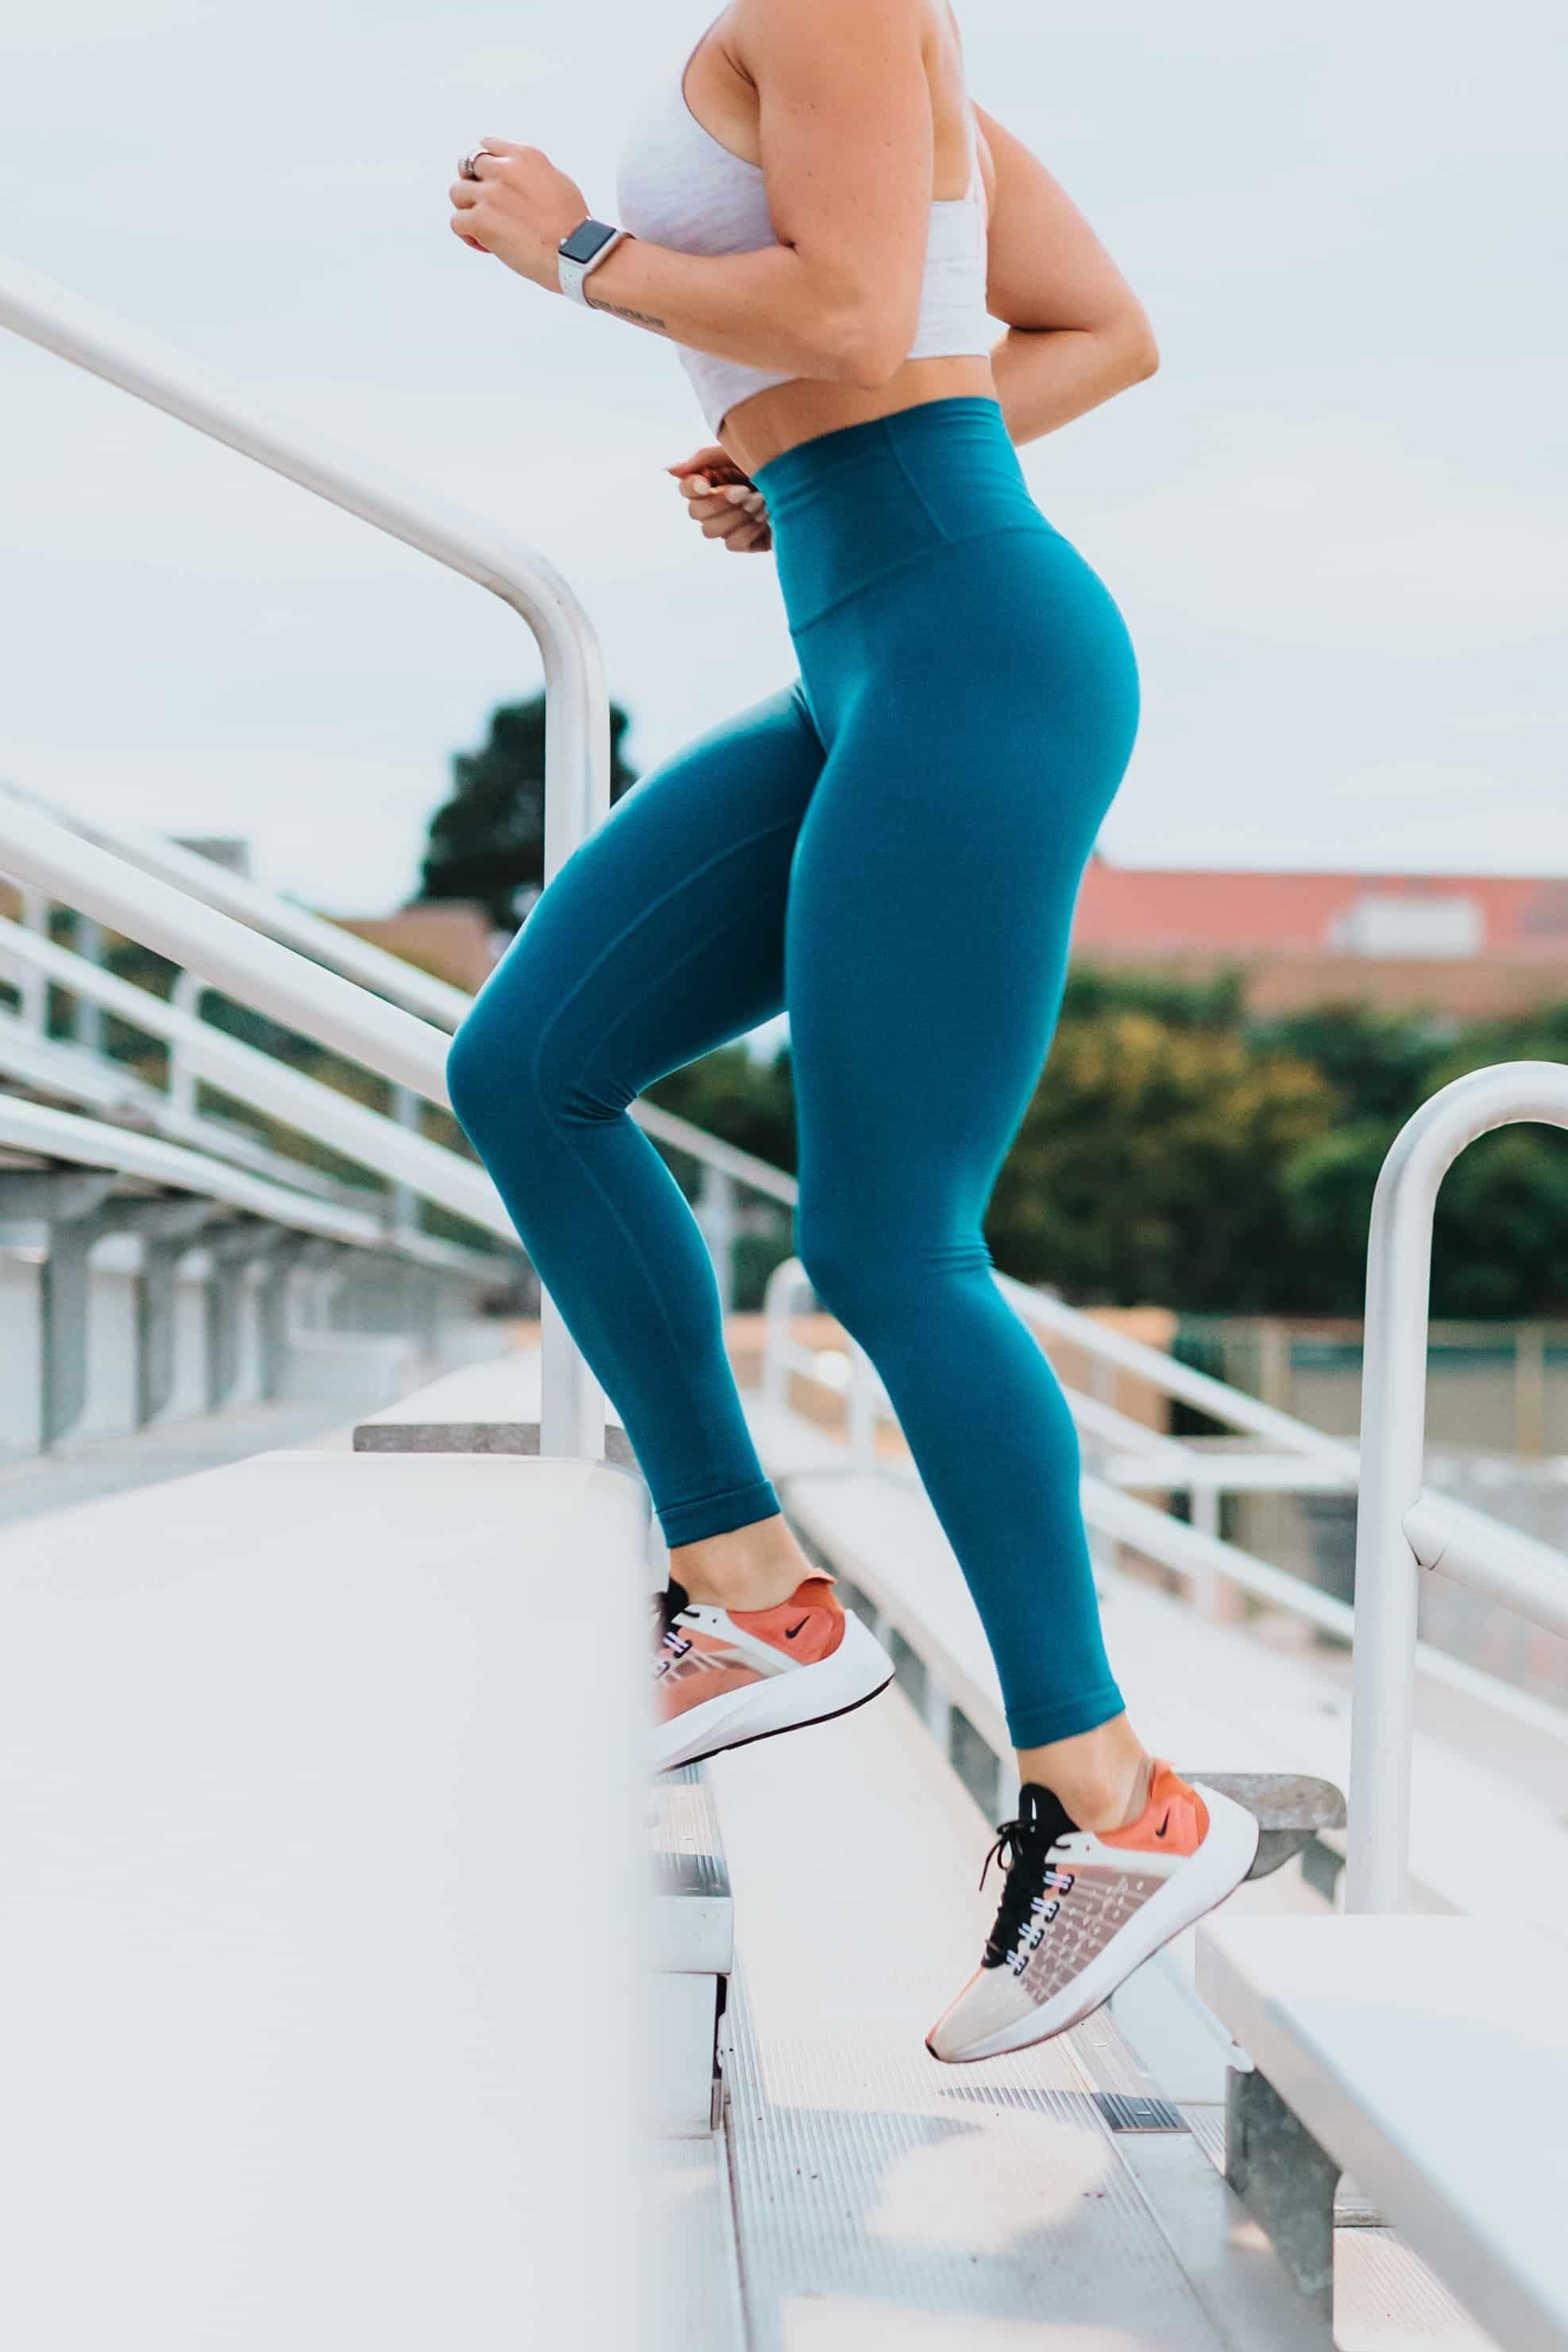 woman exercising benefit chiropractor